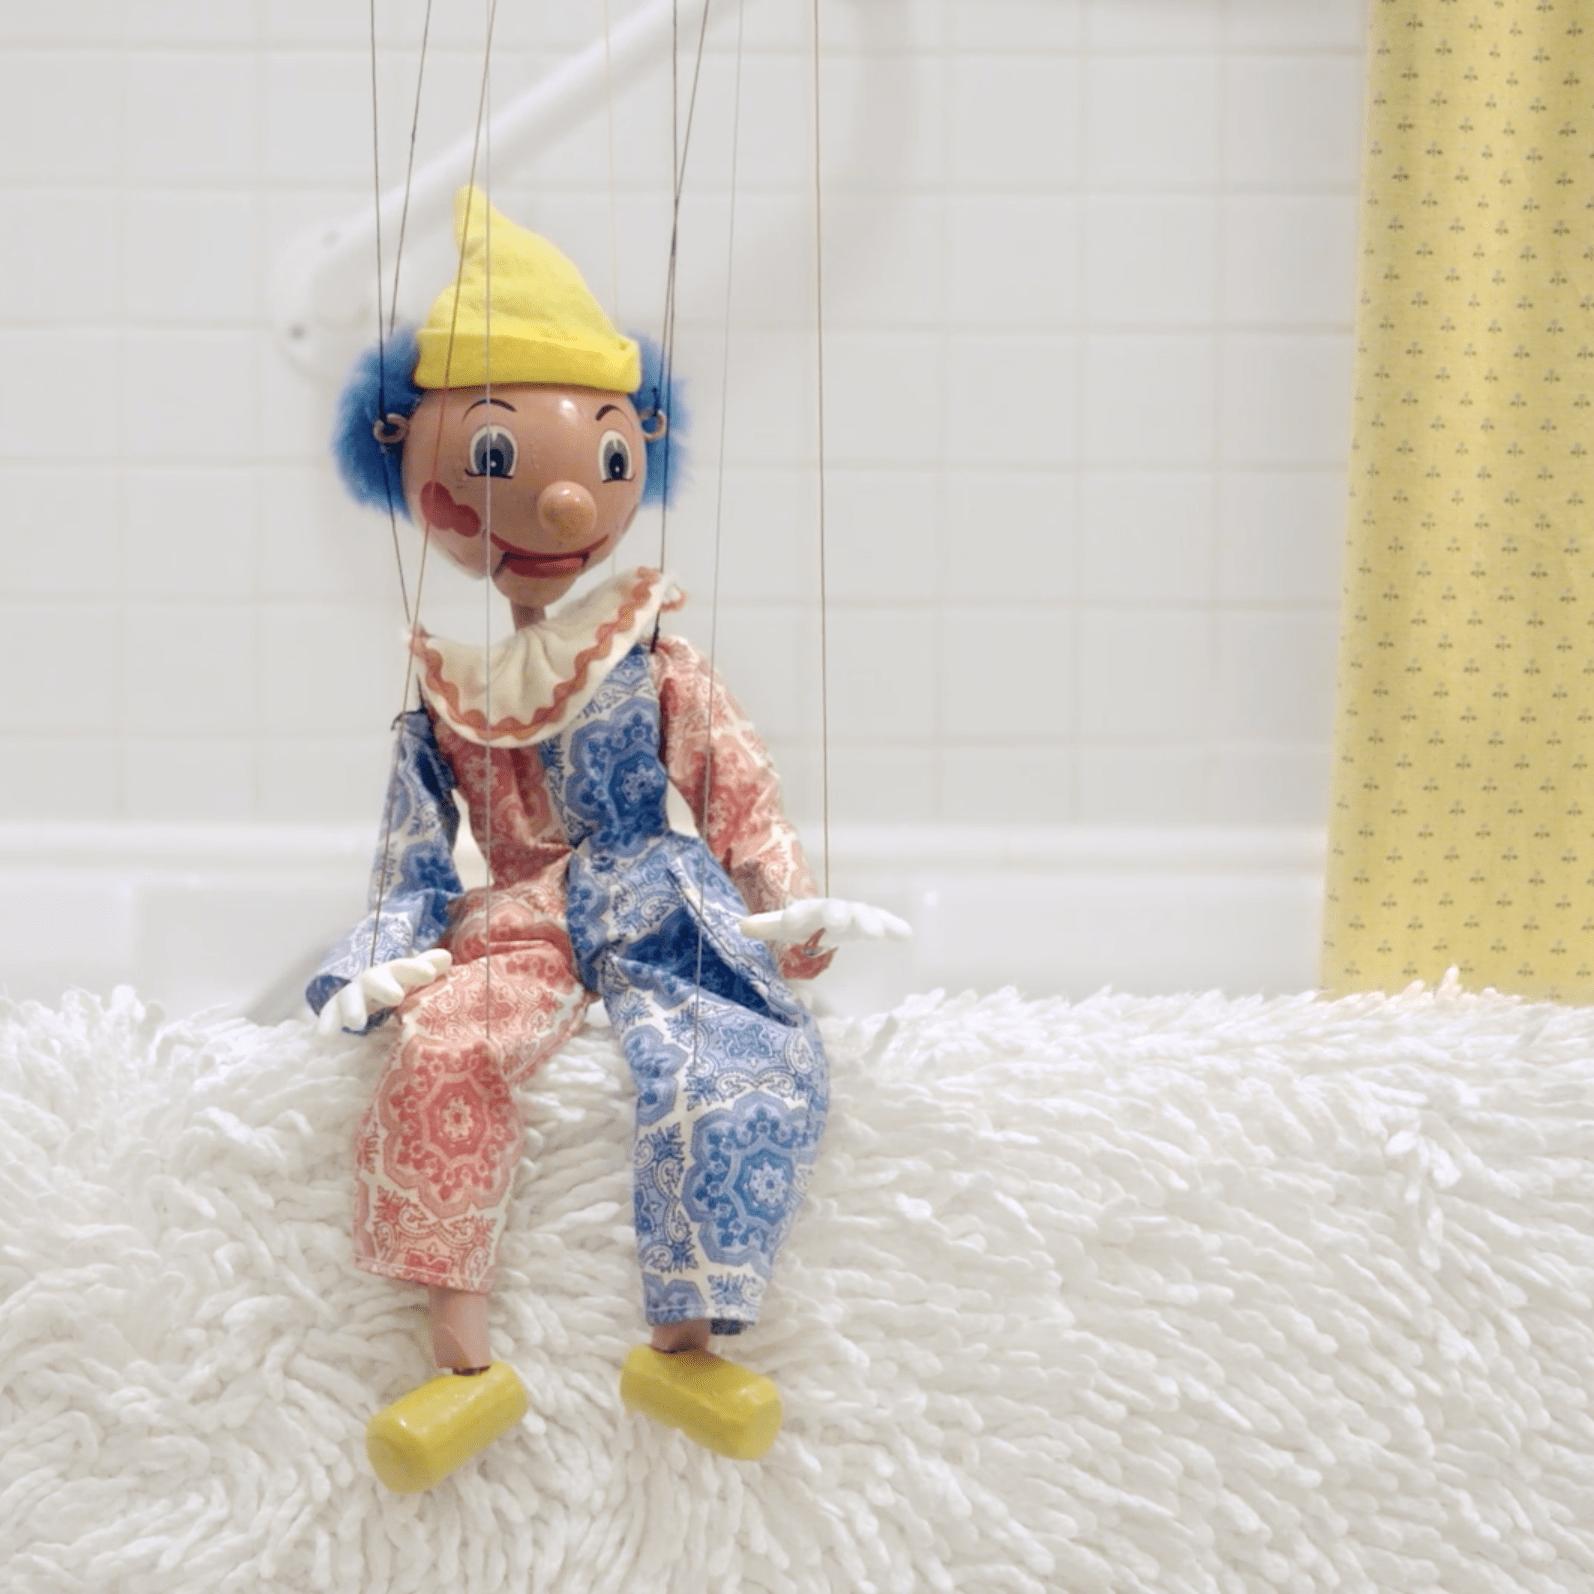 a puppet on edge of bathtub.